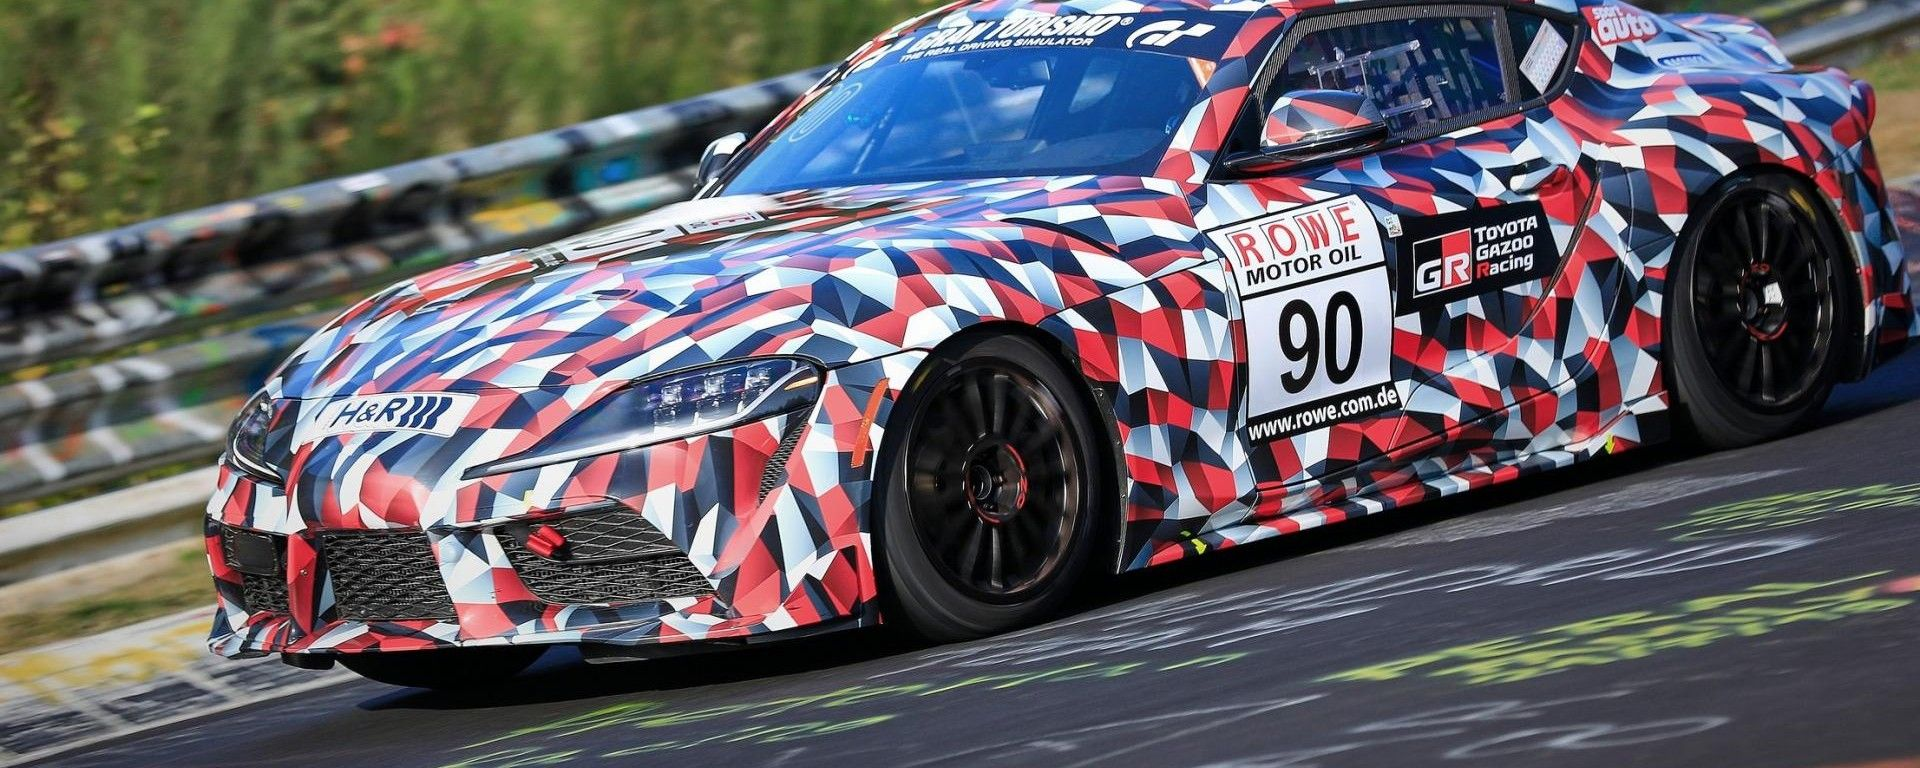 Toyota Supra 2019, le foto spia al Nurburgring